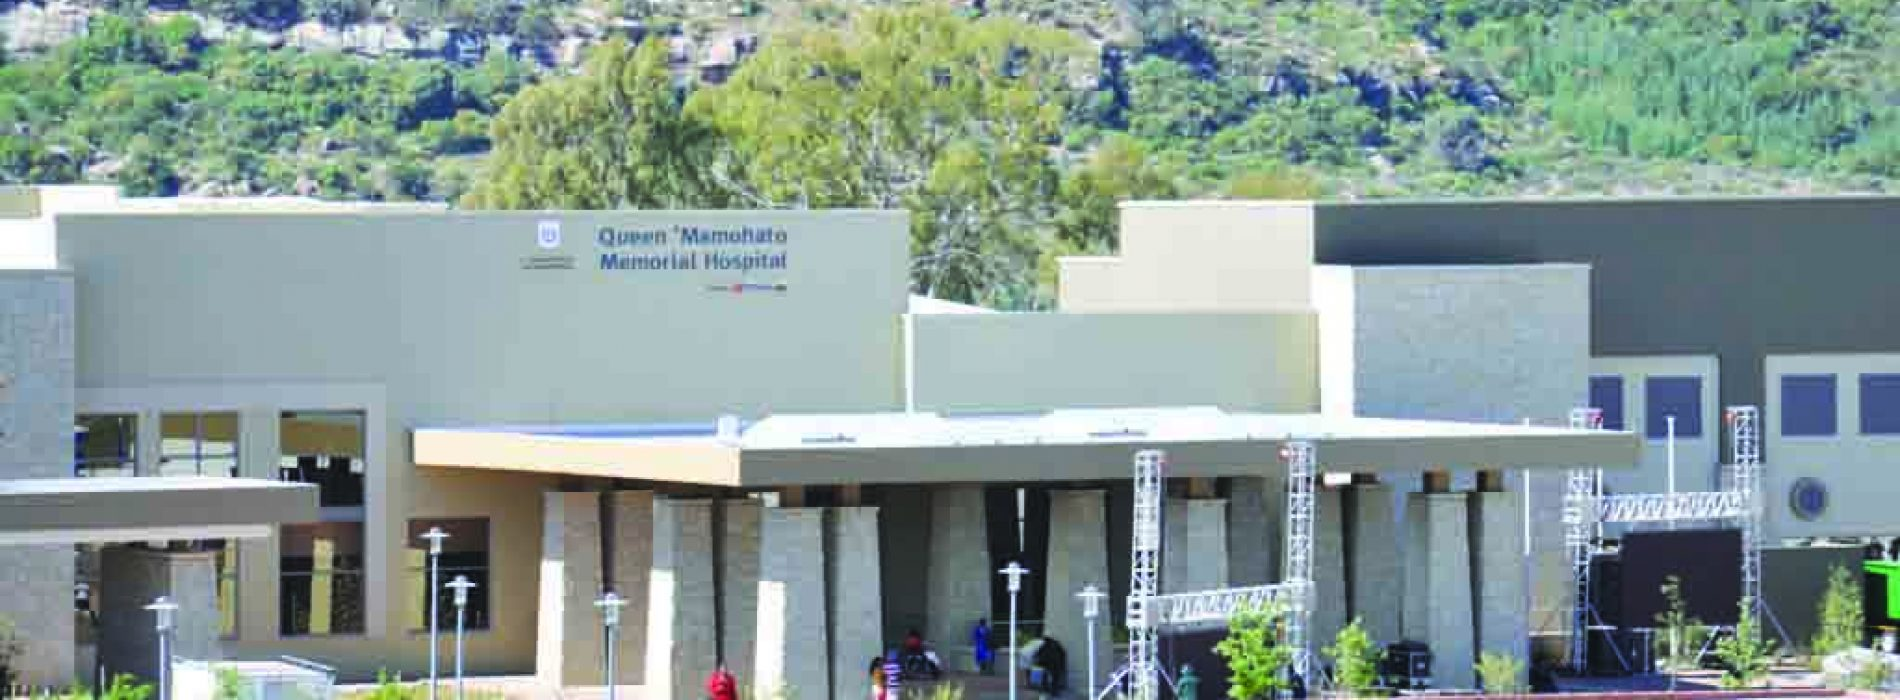 Oxygen crisis hits Queen Mamohato